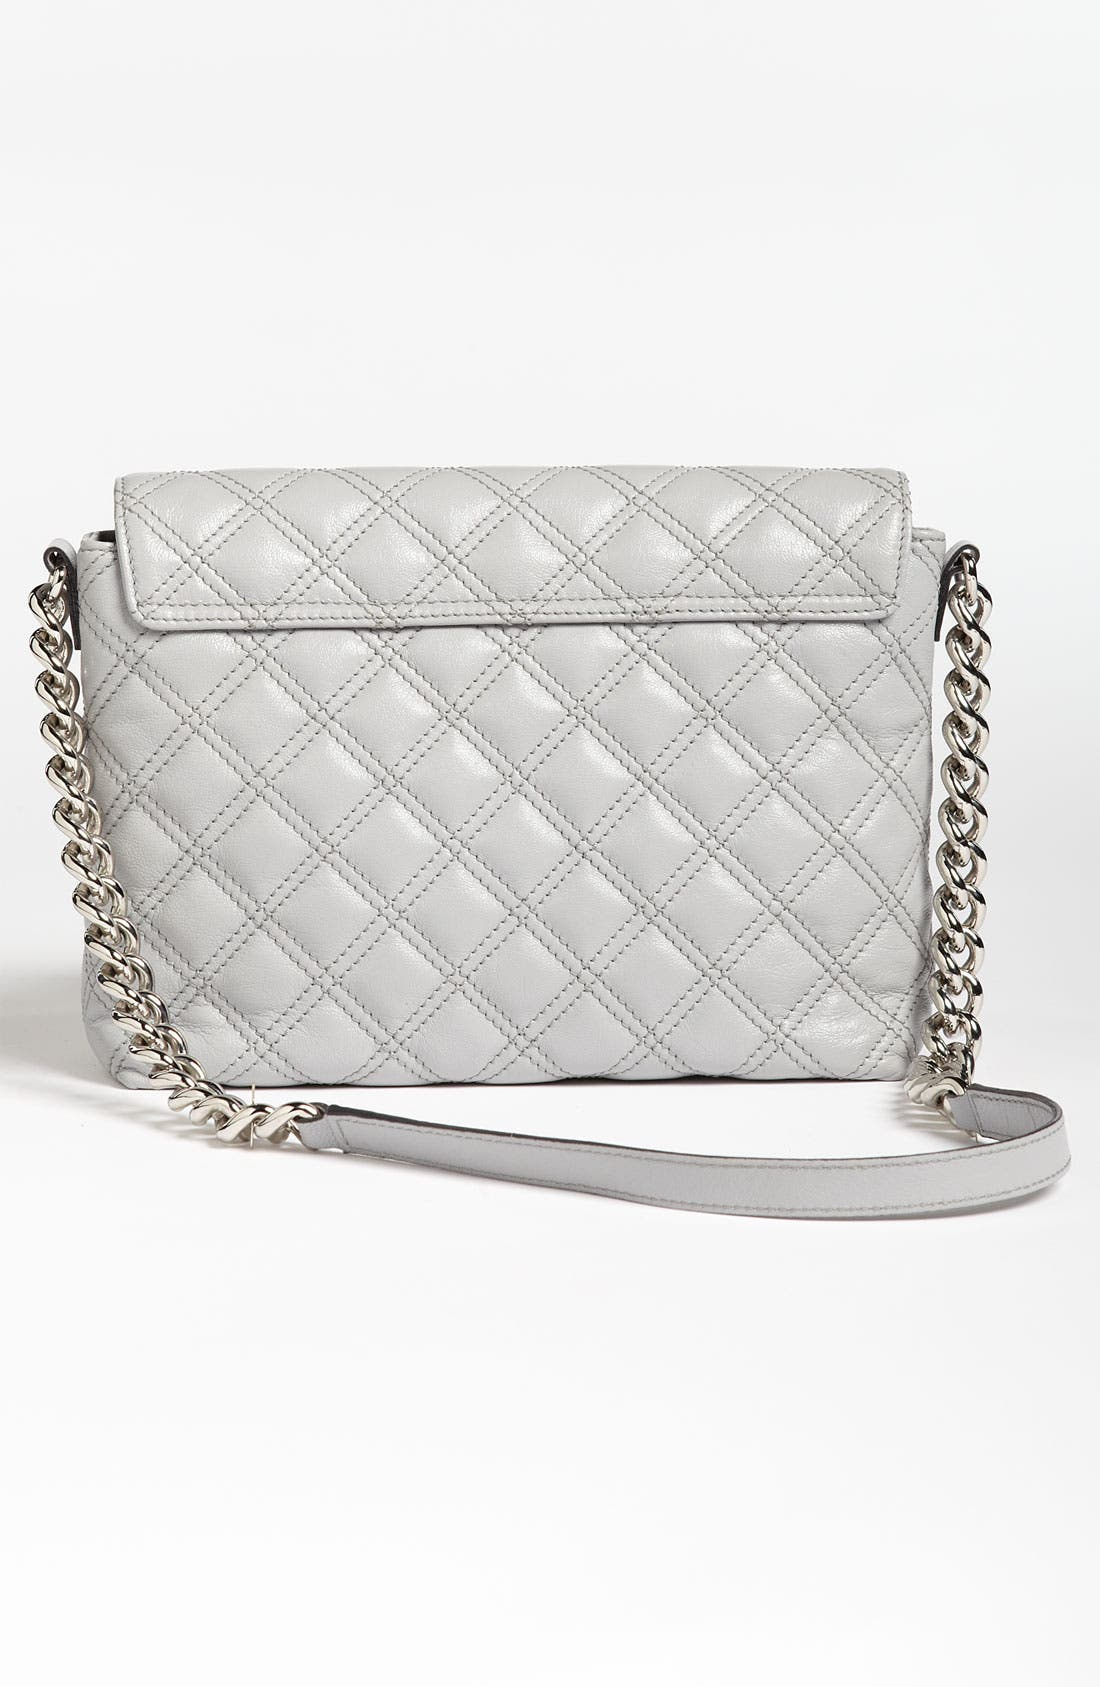 ,                             'Large Quilting Single' Leather Shoulder Bag,                             Alternate thumbnail 14, color,                             020